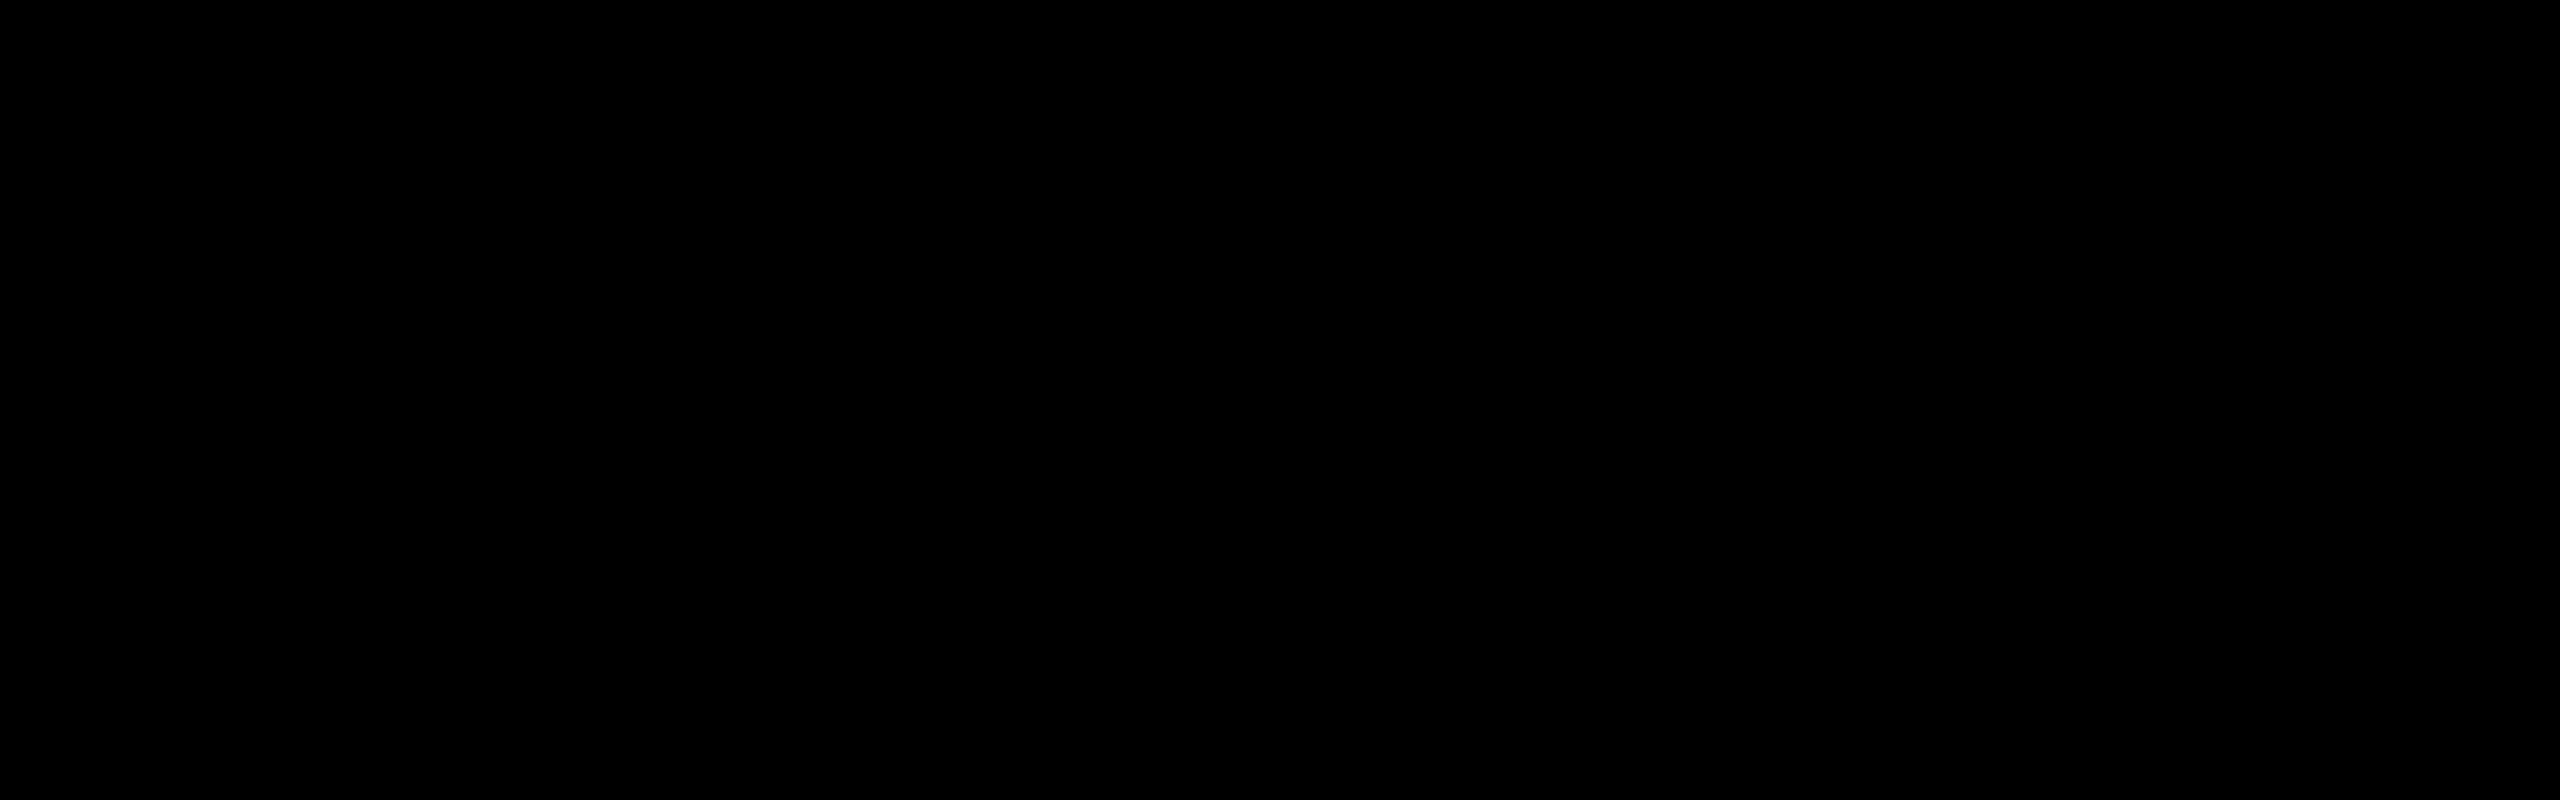 dots8